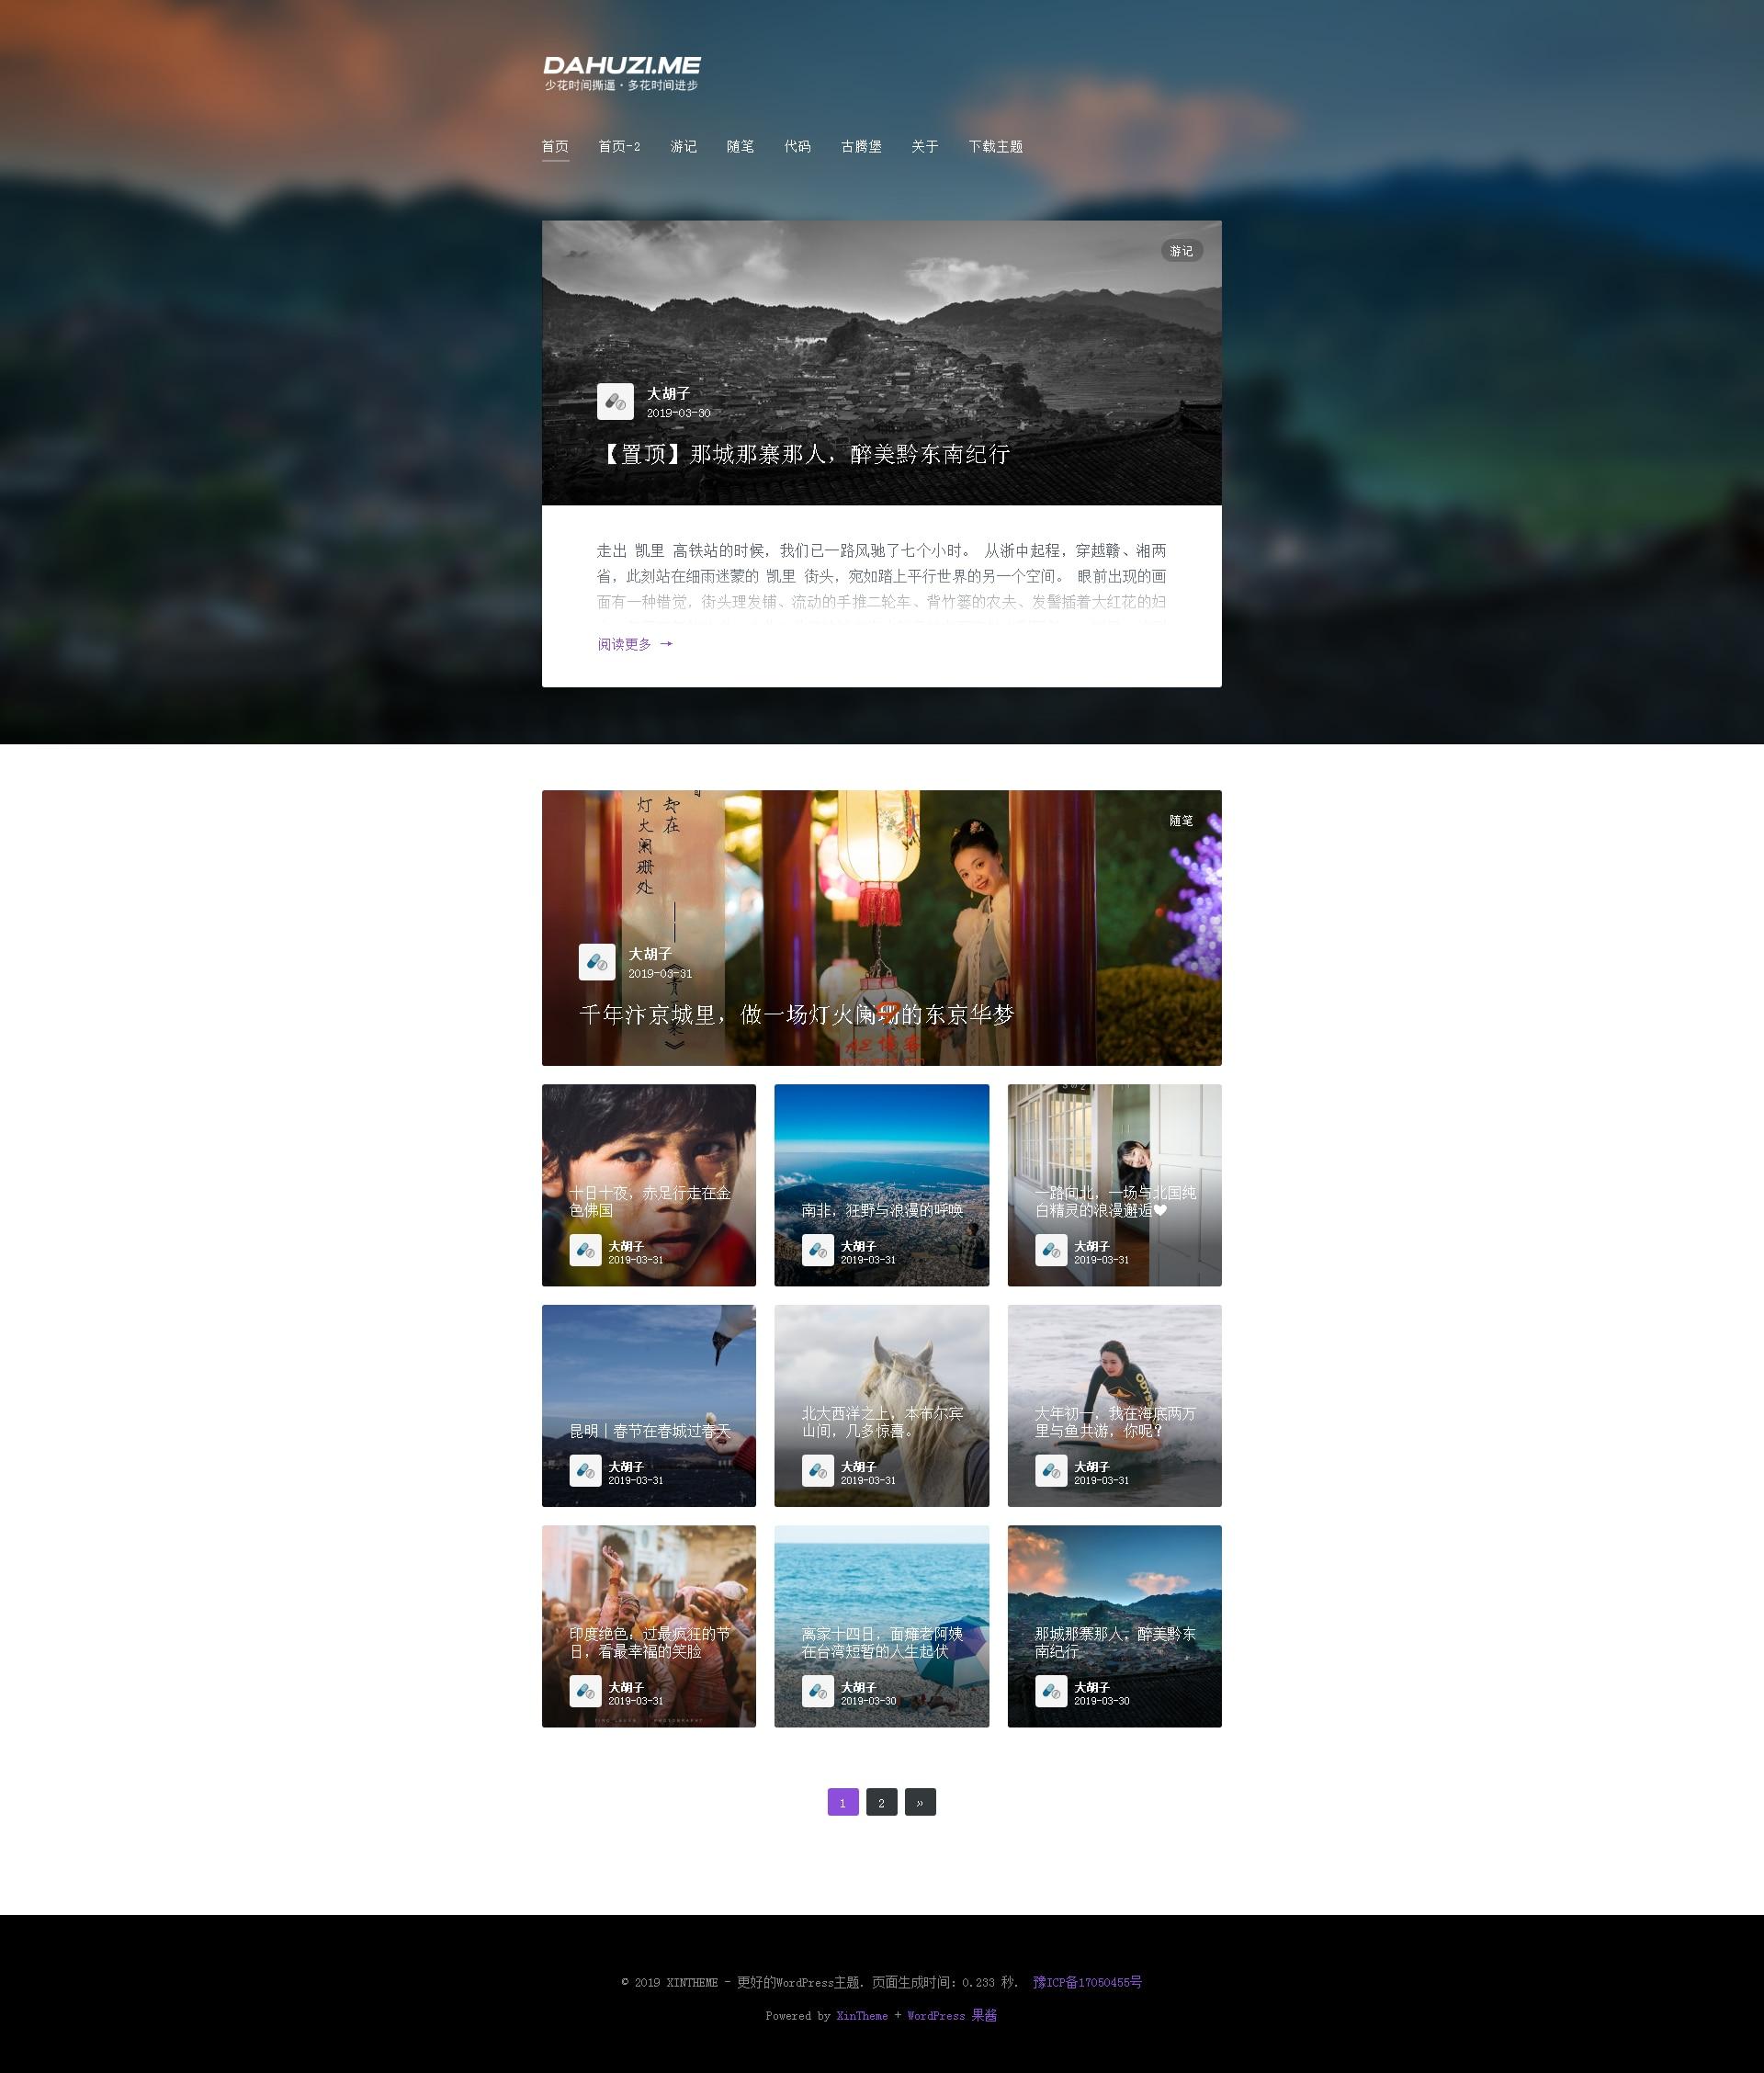 Sweet 又一款免费的简洁优雅的WordPress博客主题 第1张